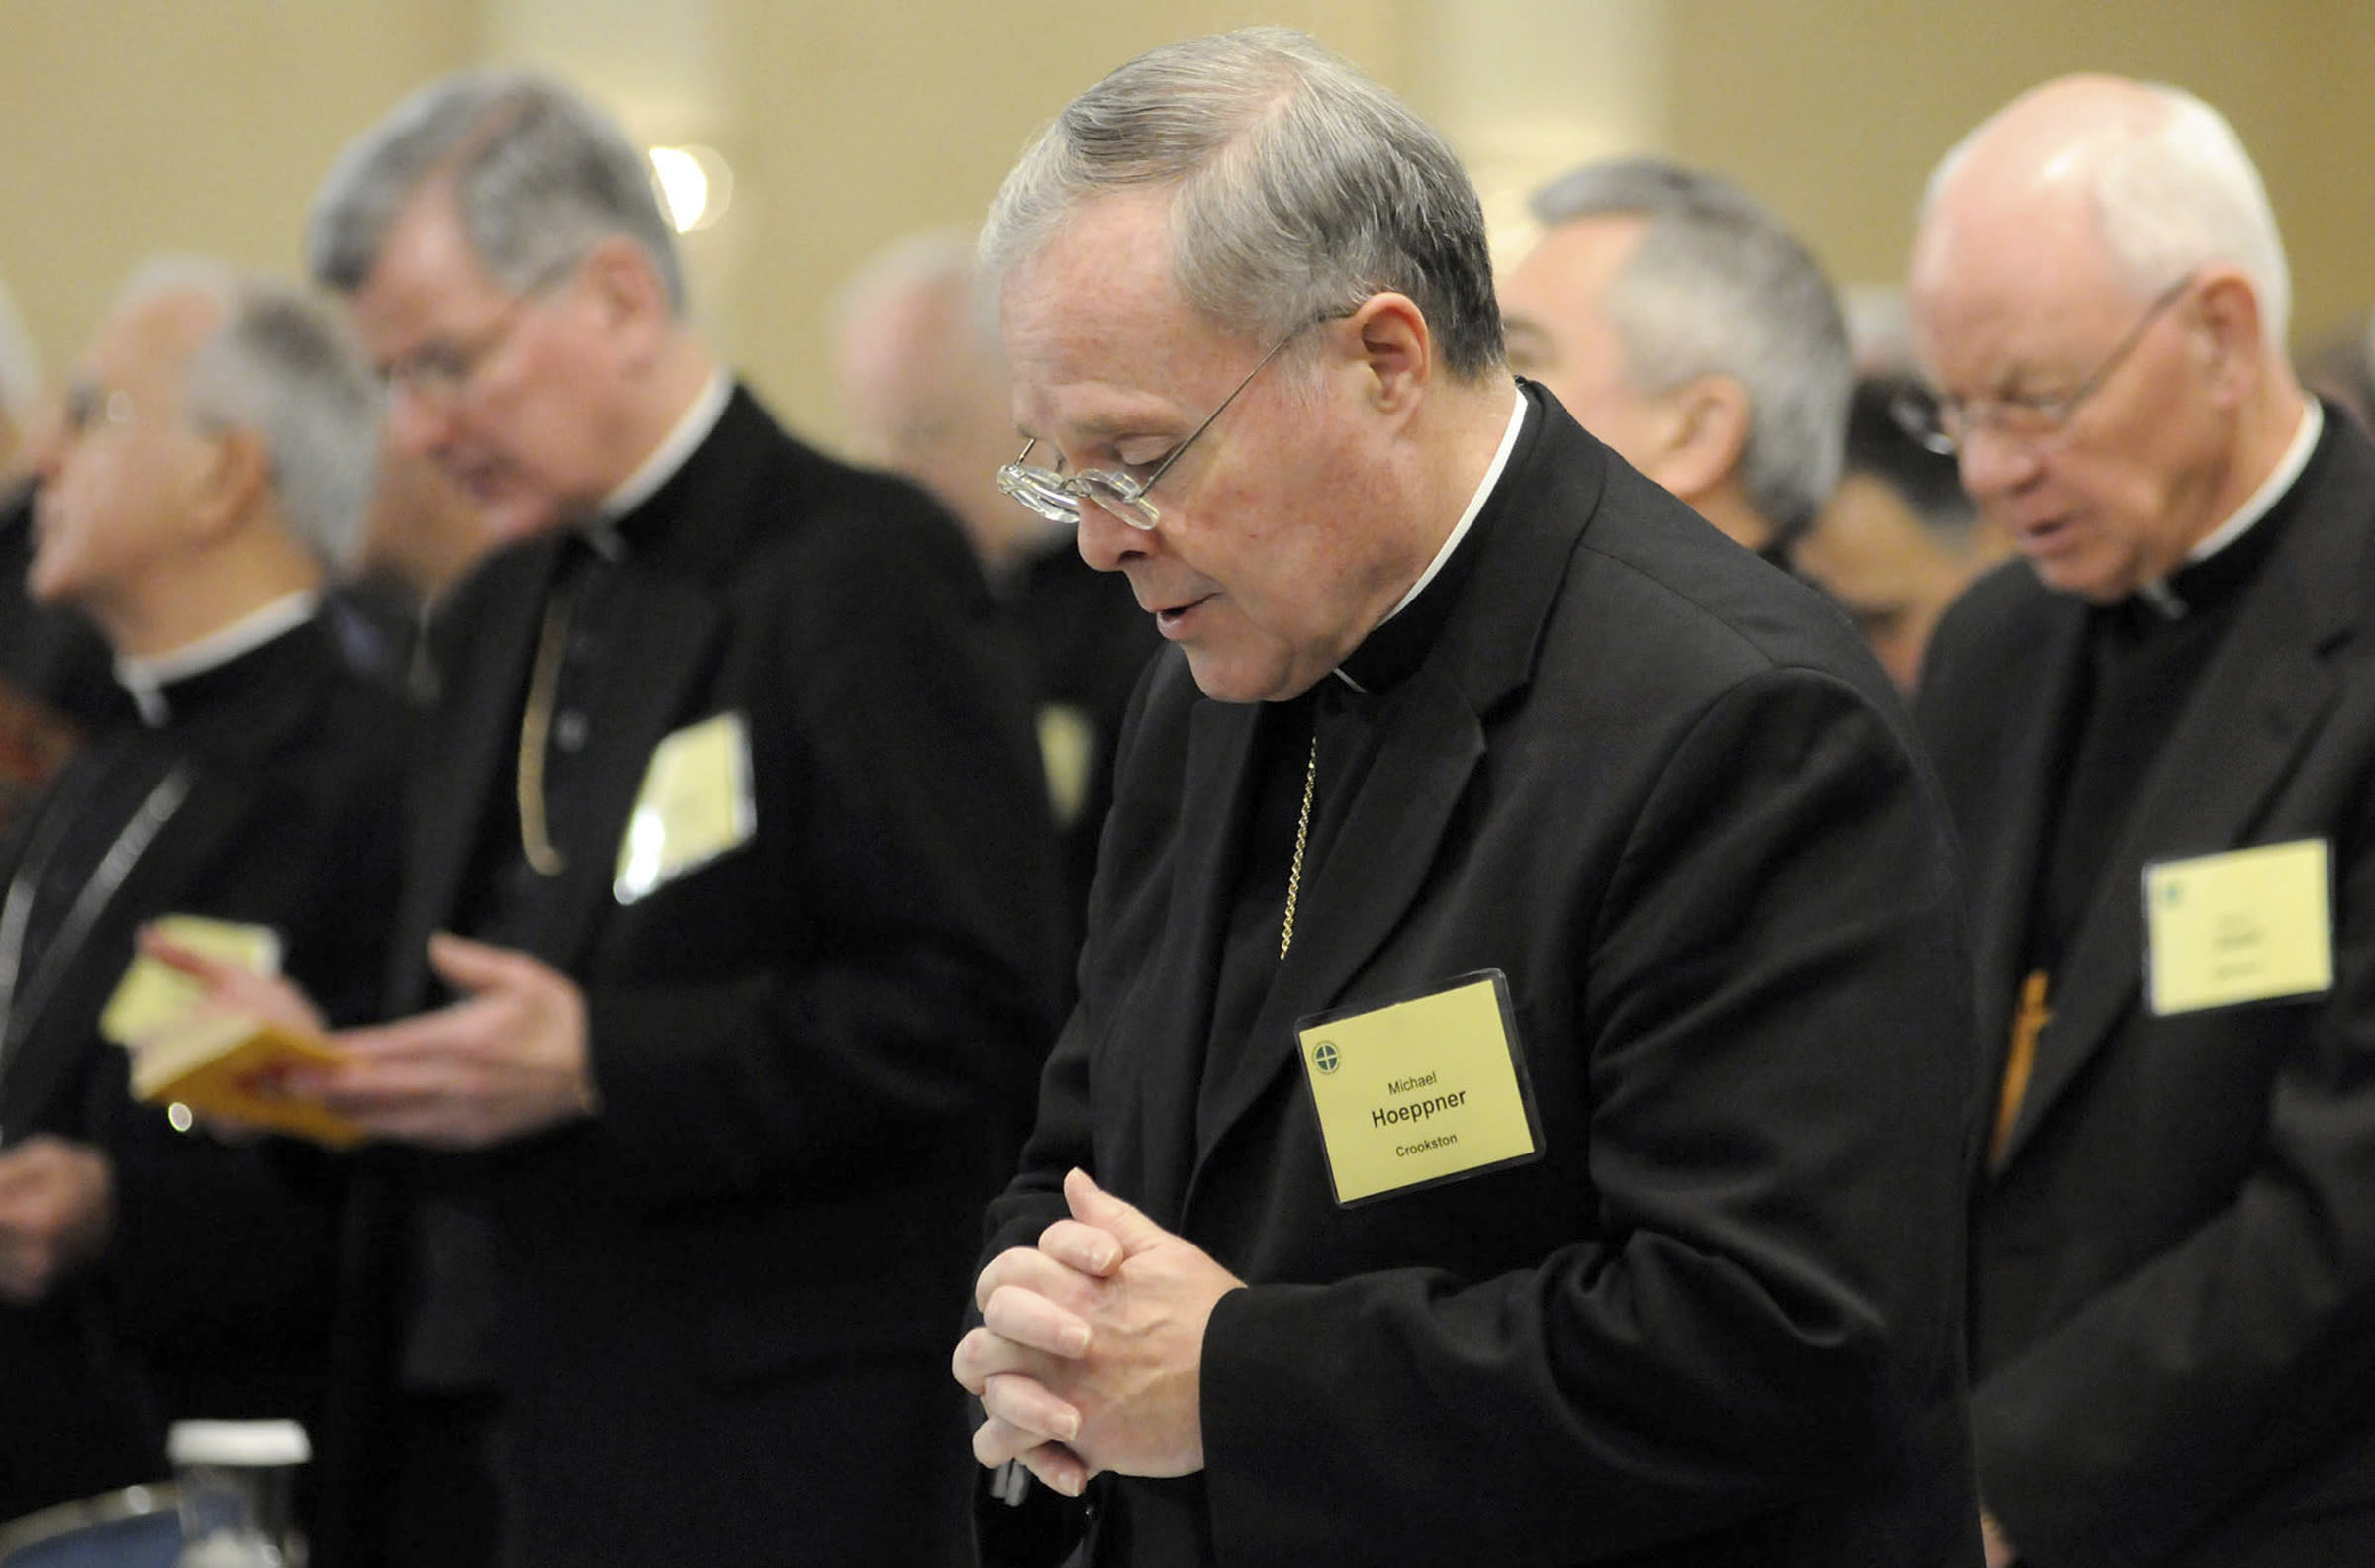 Minnesota archbishop opens investigation into fellow bishop